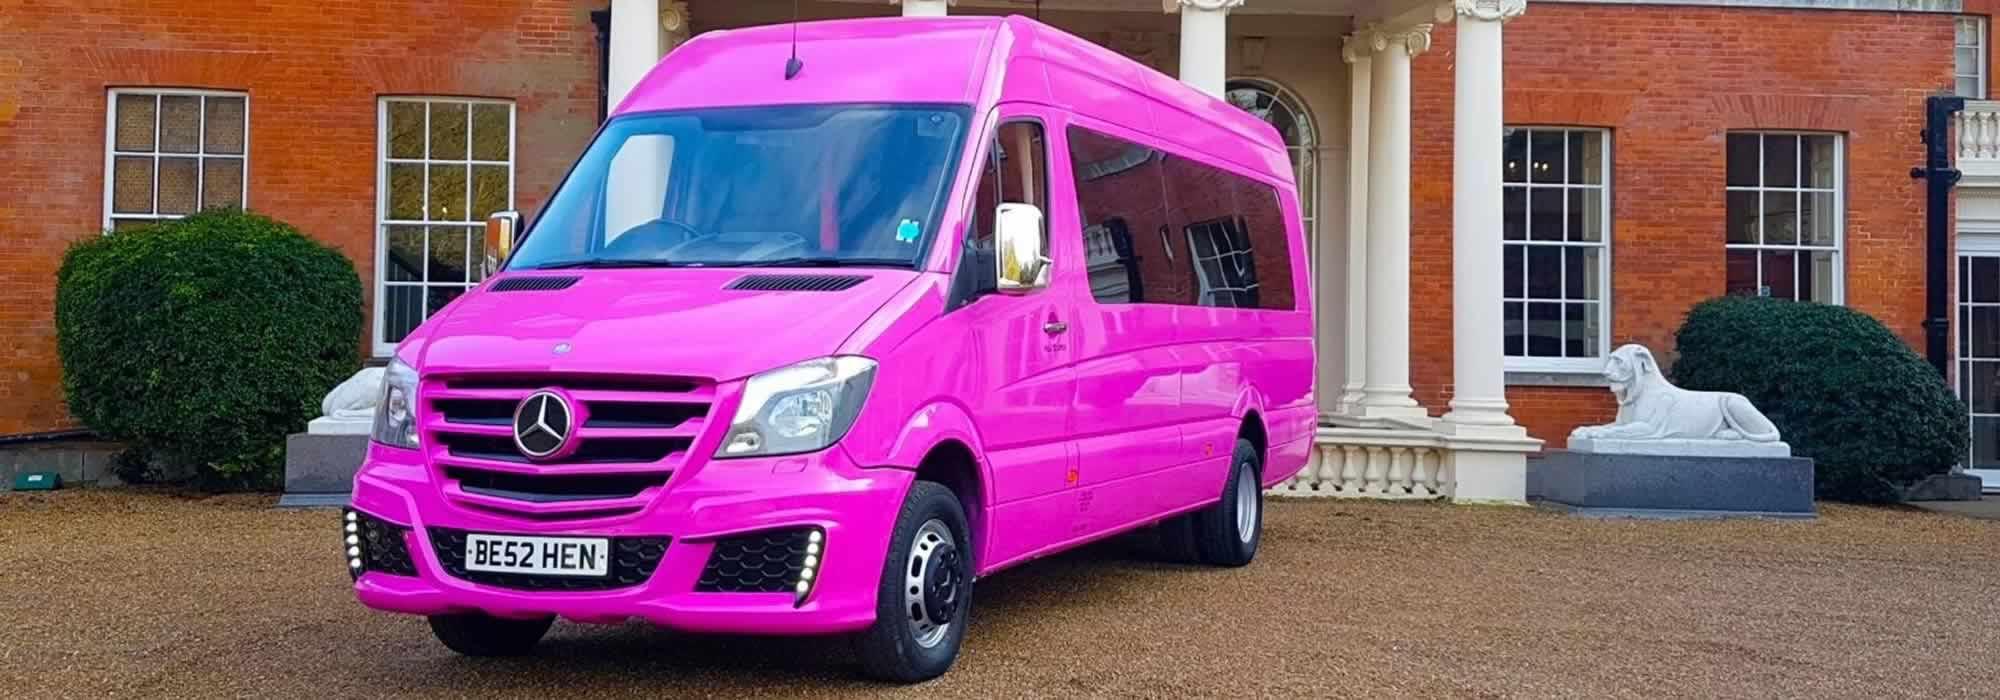 mercedes-pink-party-bus-exterior2-web